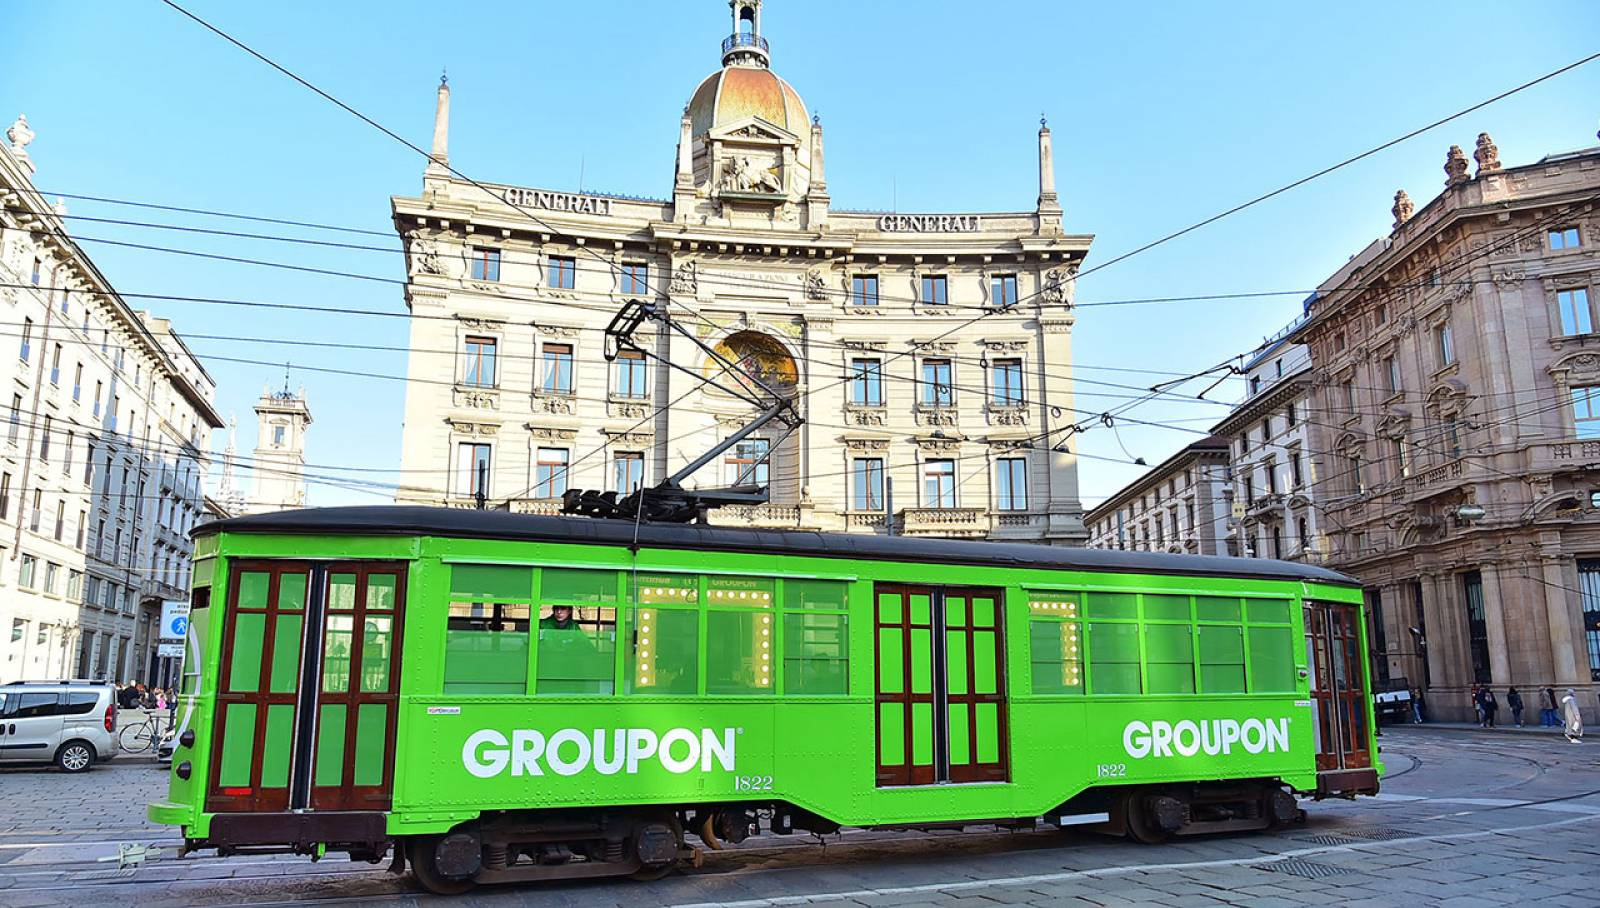 IGPDecaux Milan tram for Groupon